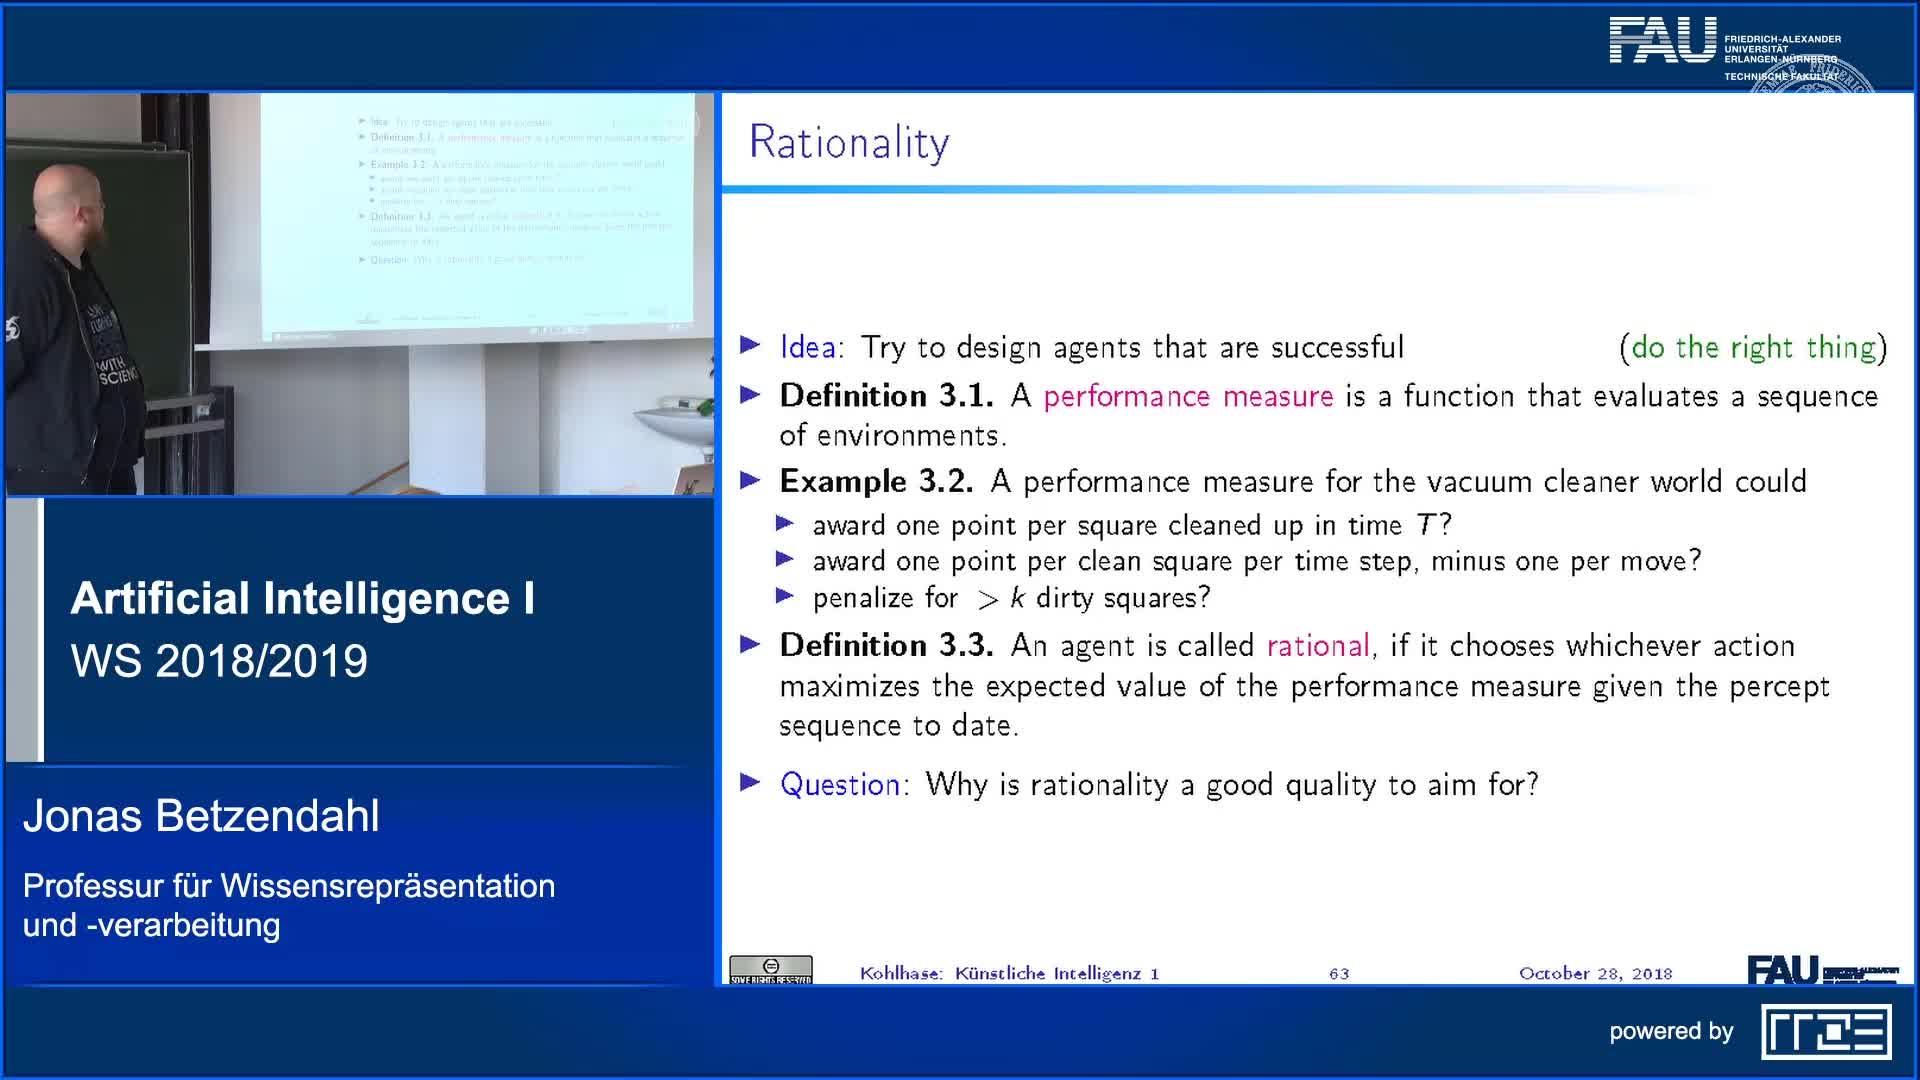 Good Behavior ~> Rationality preview image